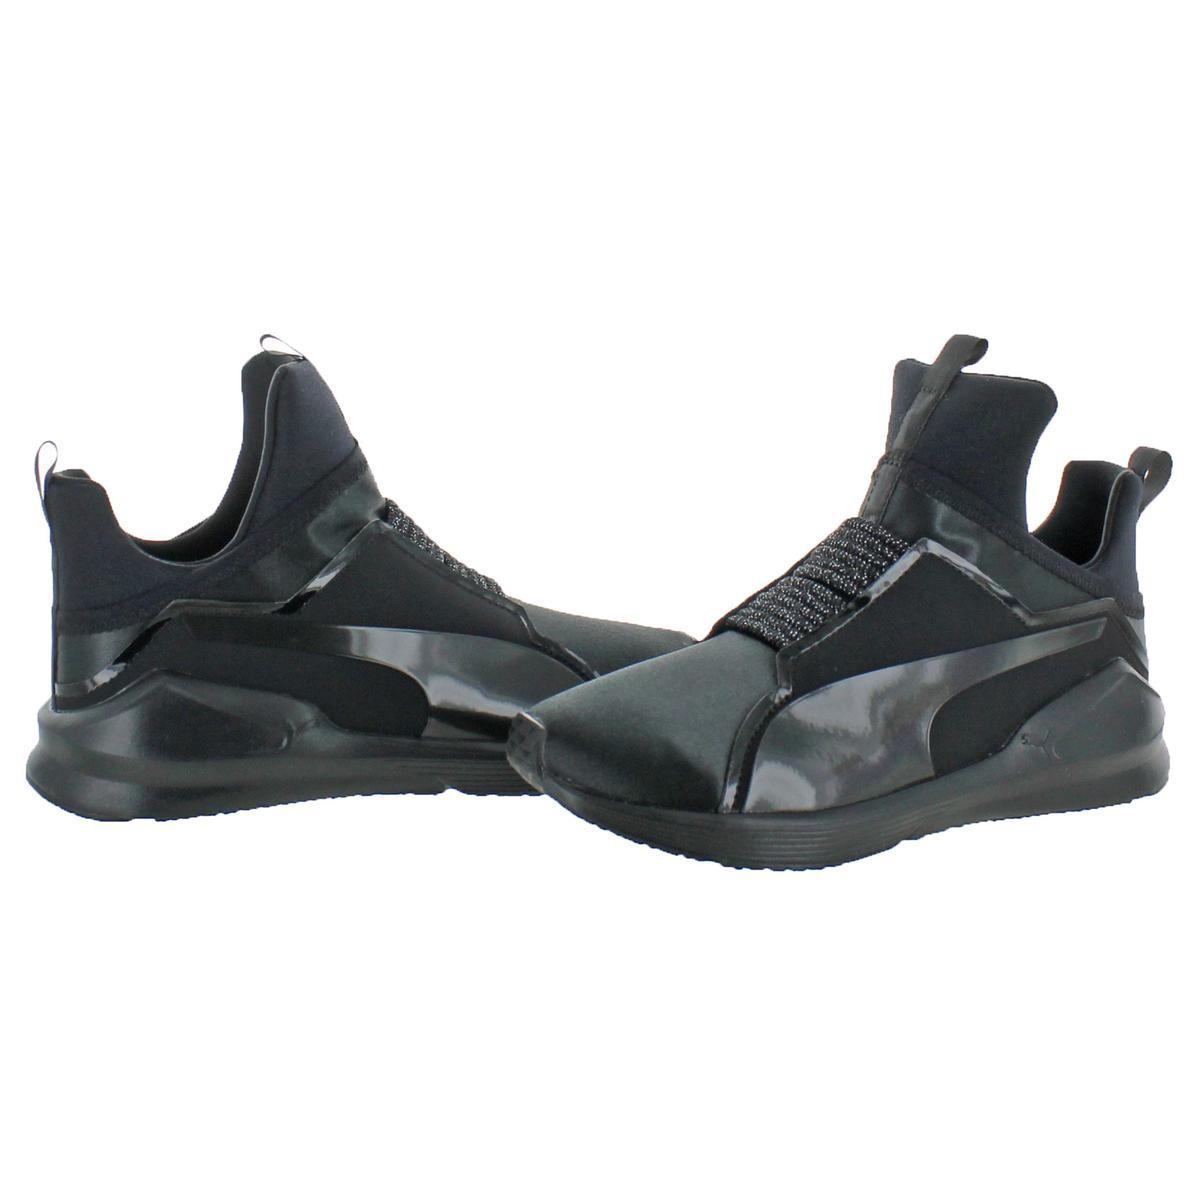 Puma Fierce Satin EP Women s Demi Height Trainer Fashion Sneaker ... 56e6619ea8d4